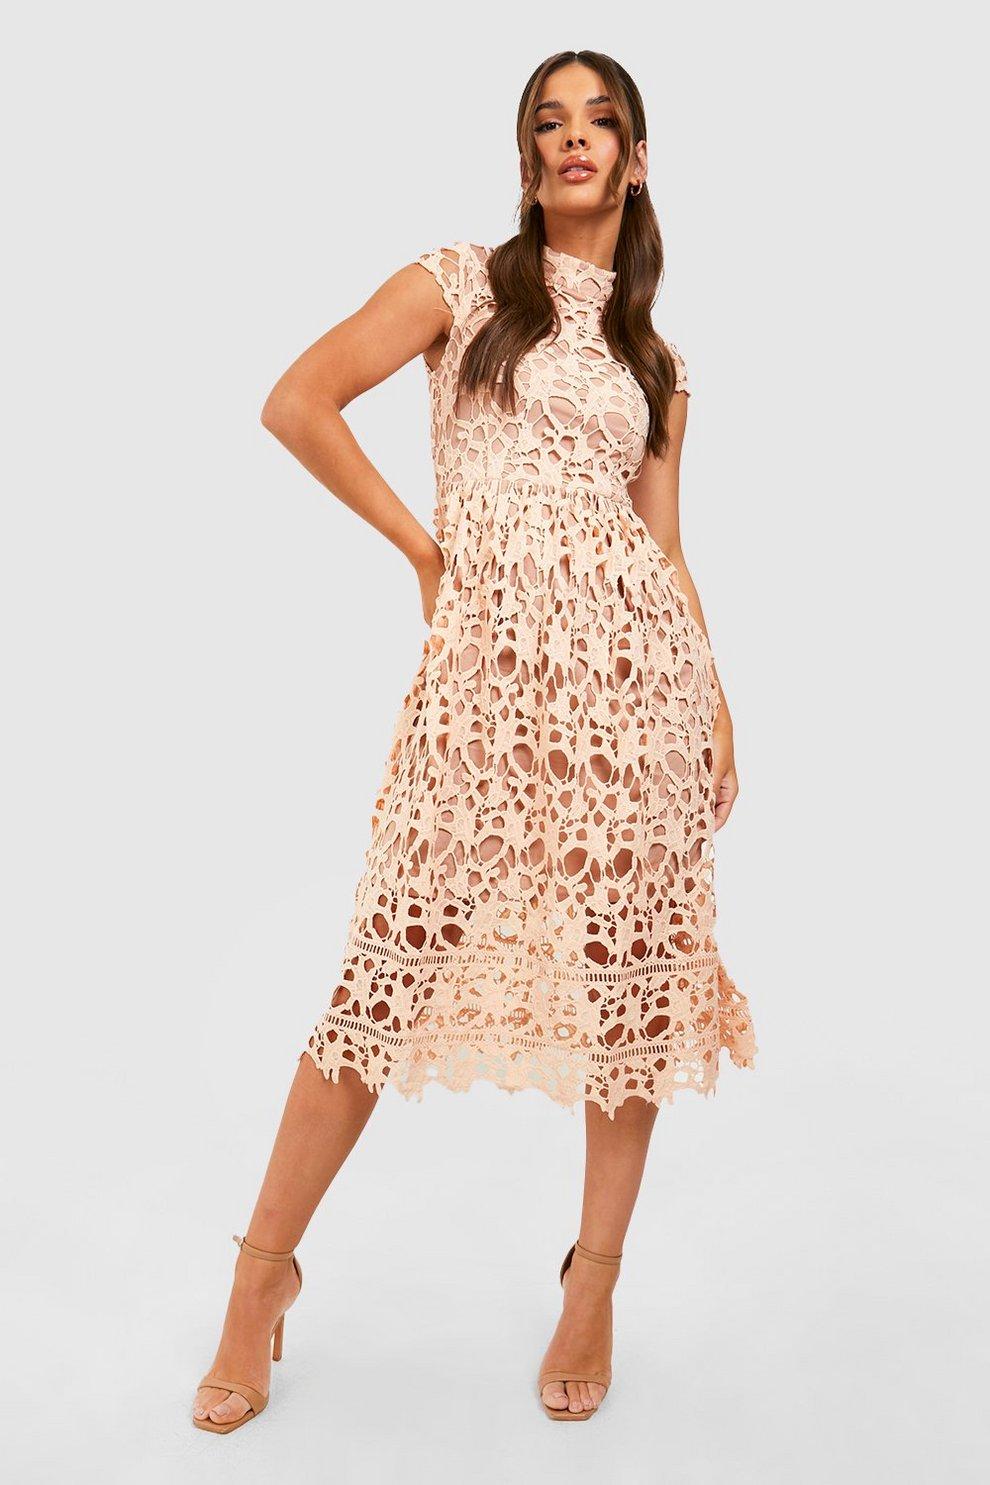 78721cc5135 Boutique Lace High Neck Skater Dress | Boohoo